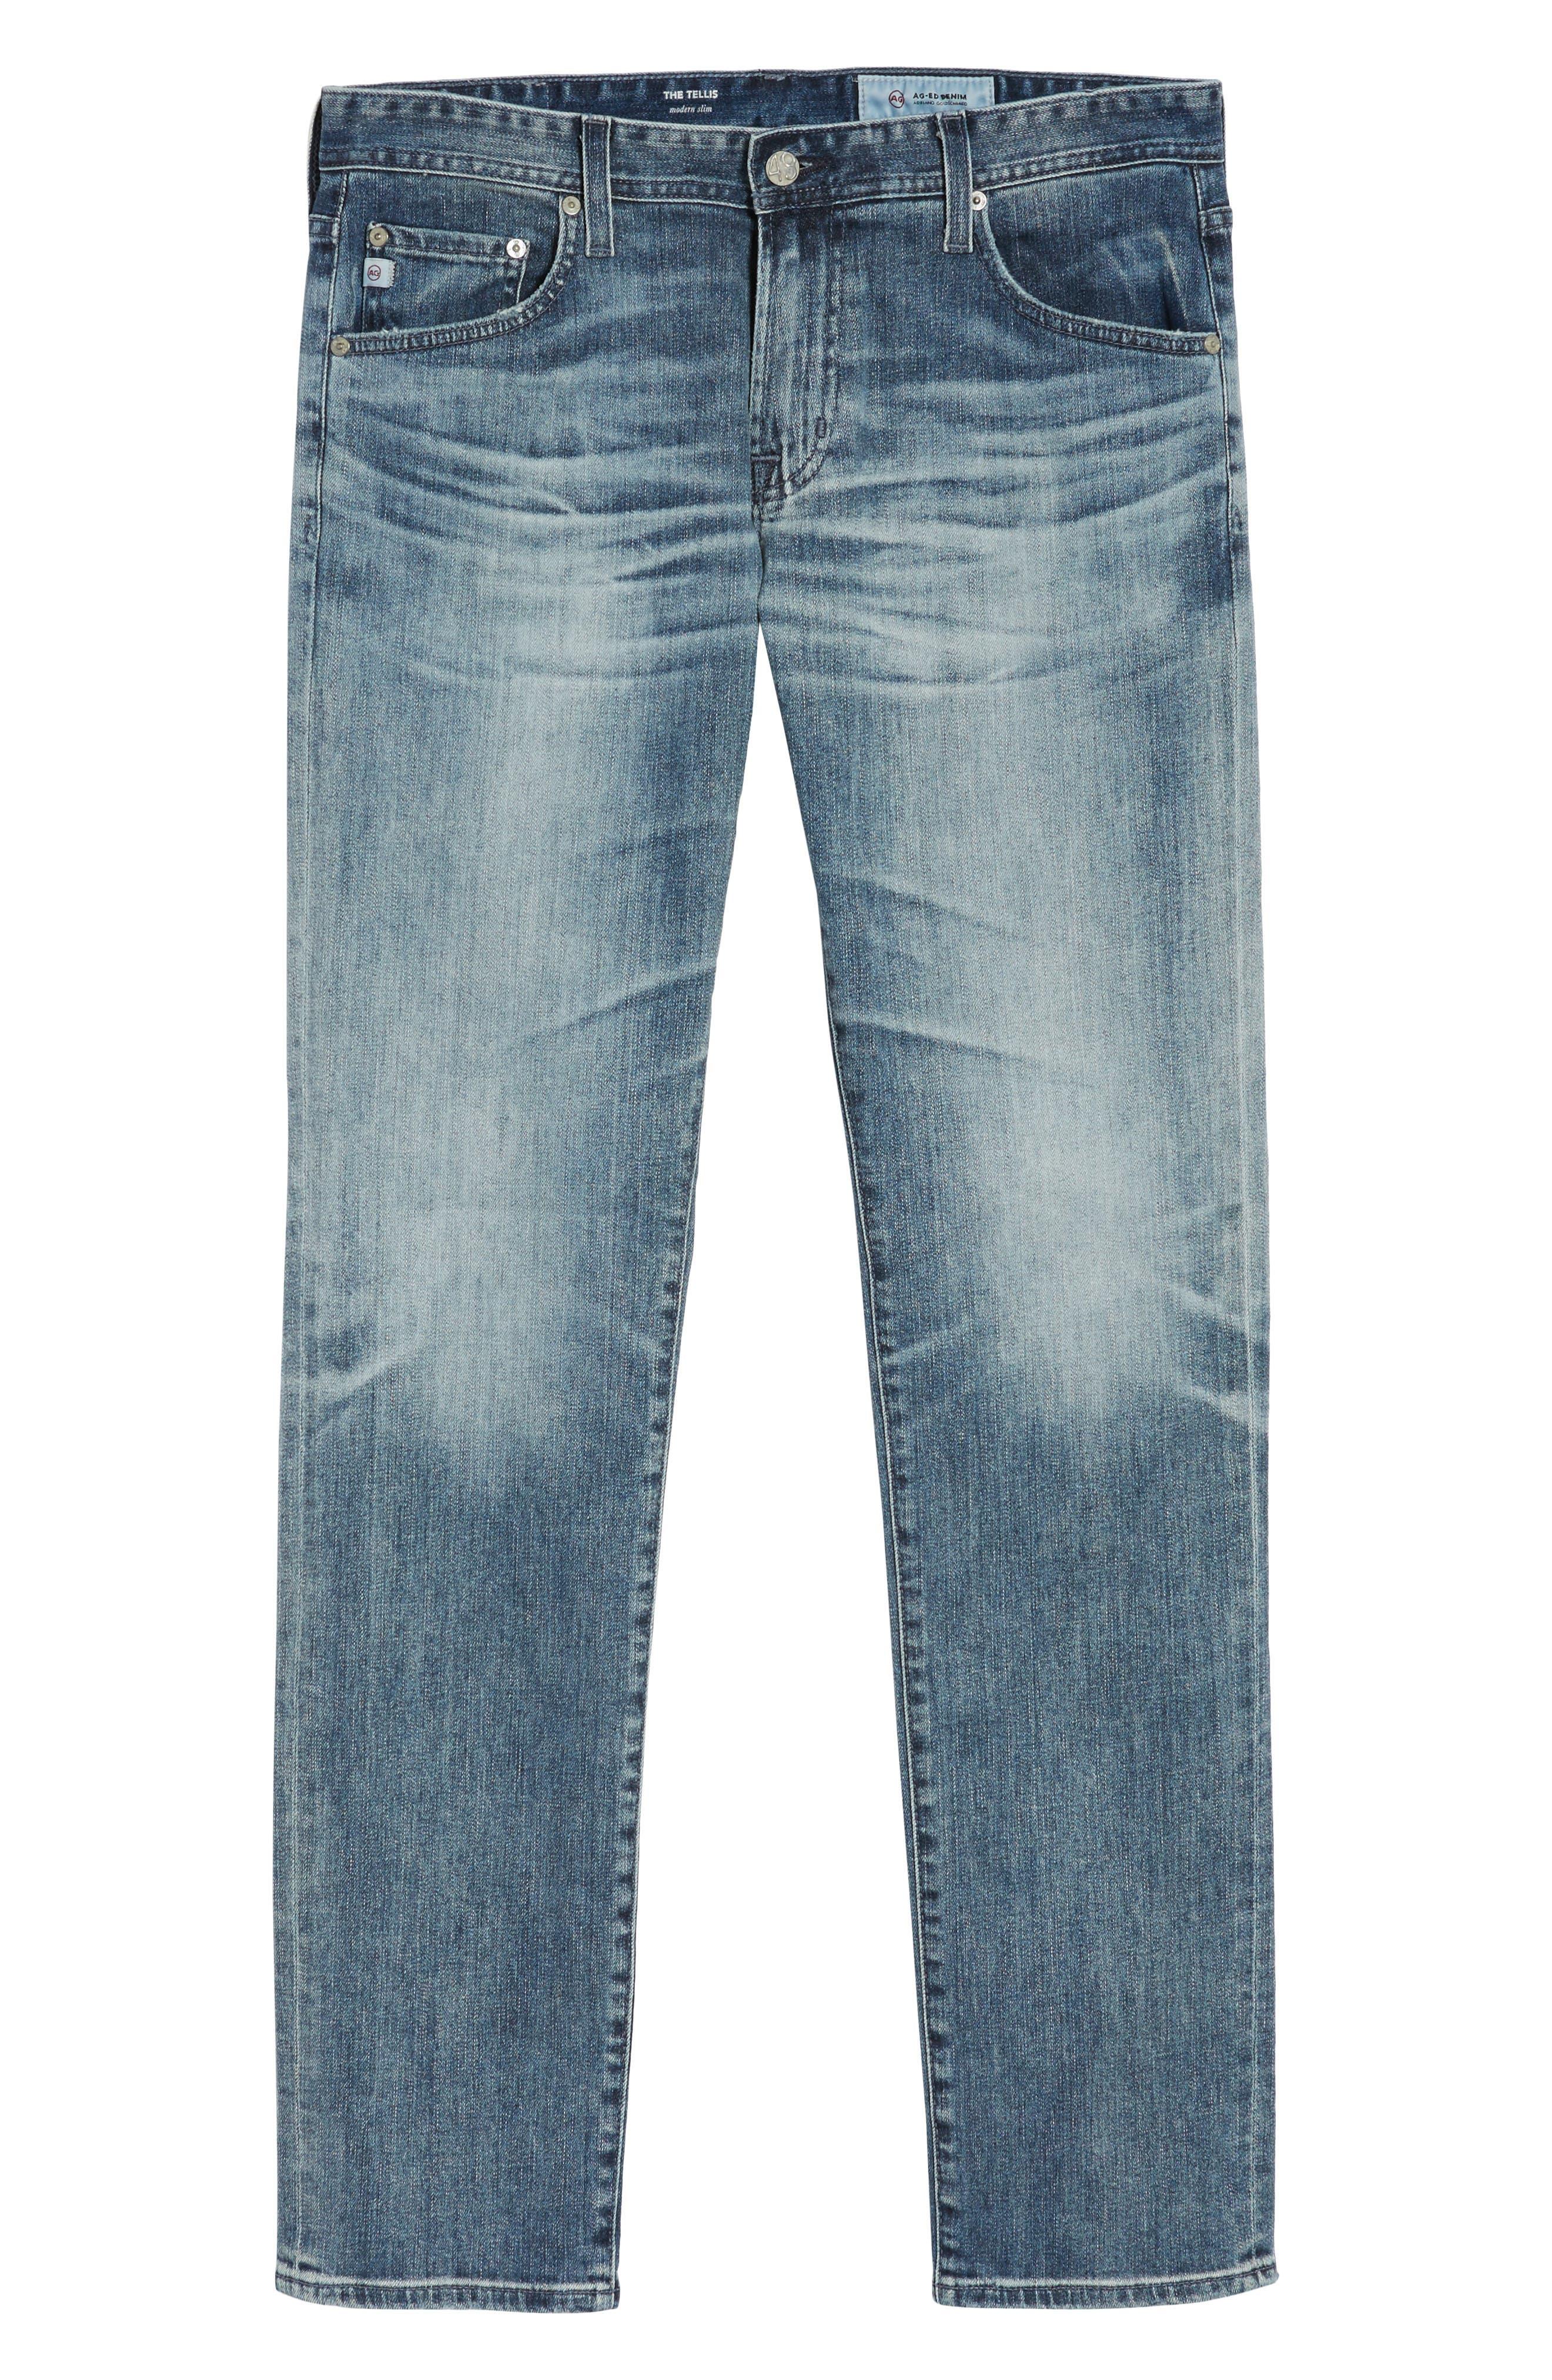 Tellis Slim Fit Jeans,                             Alternate thumbnail 6, color,                             487